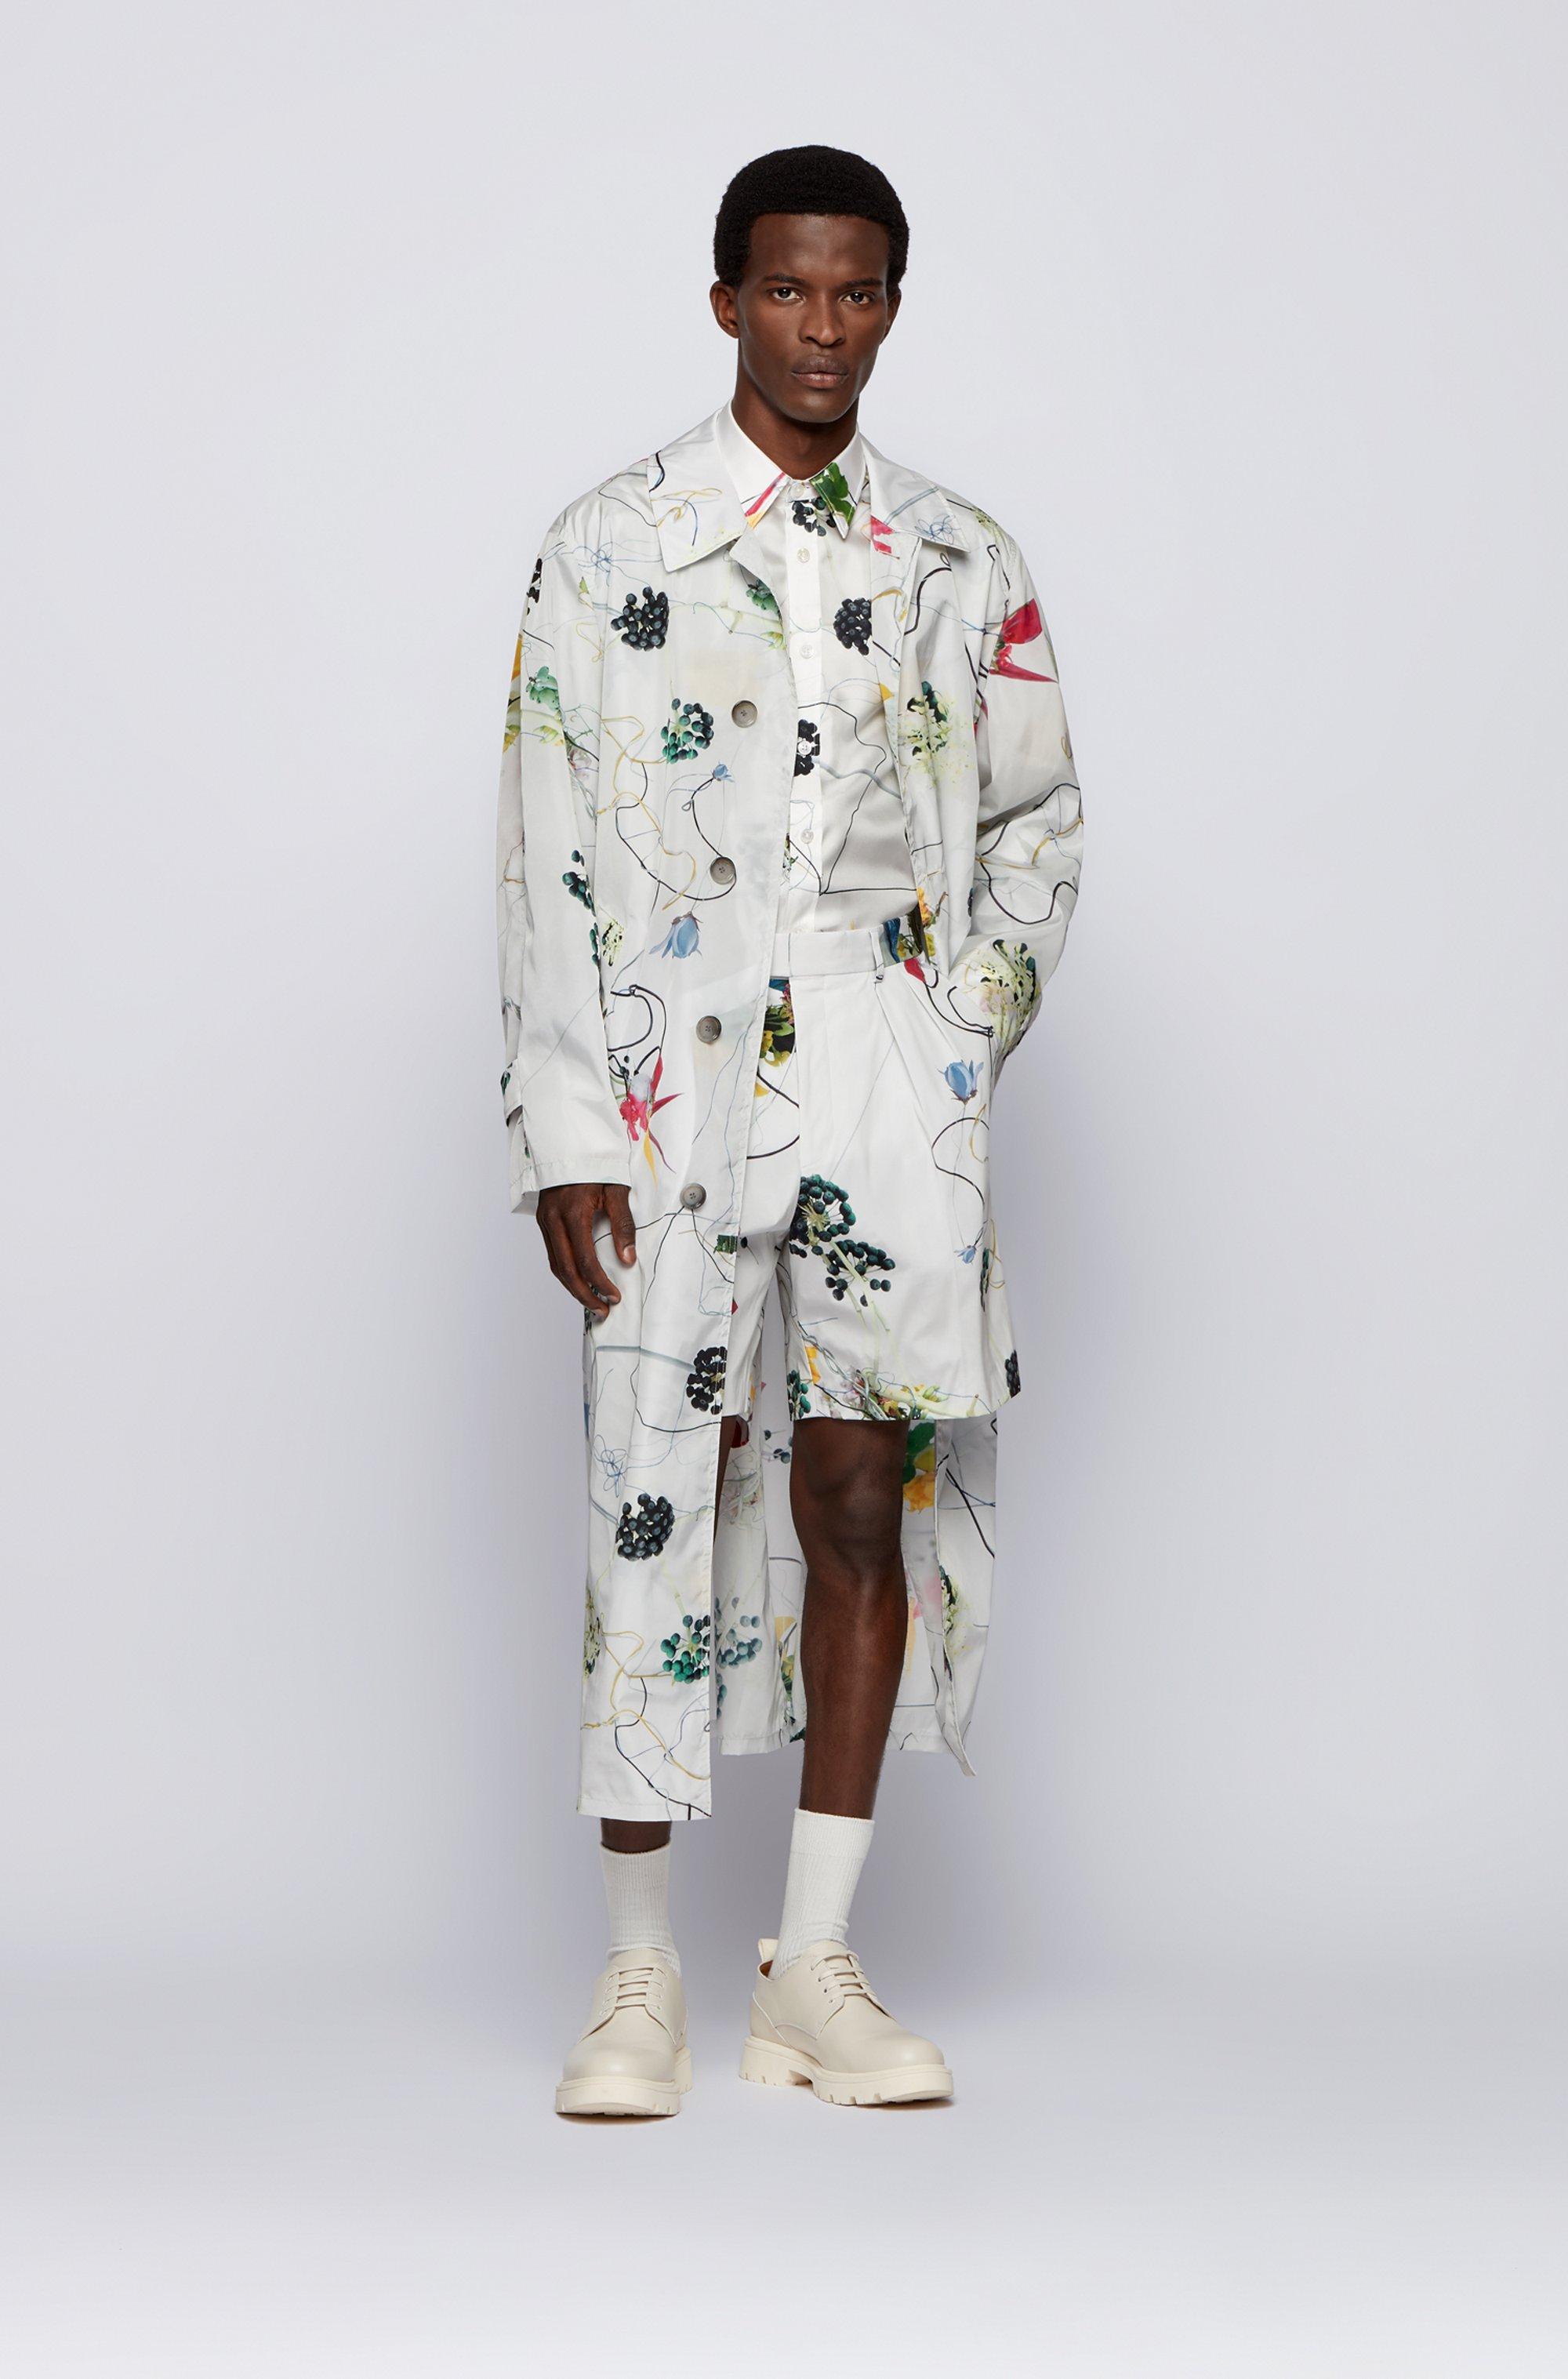 Camicia relaxed fit in seta italiana con stampa floreale